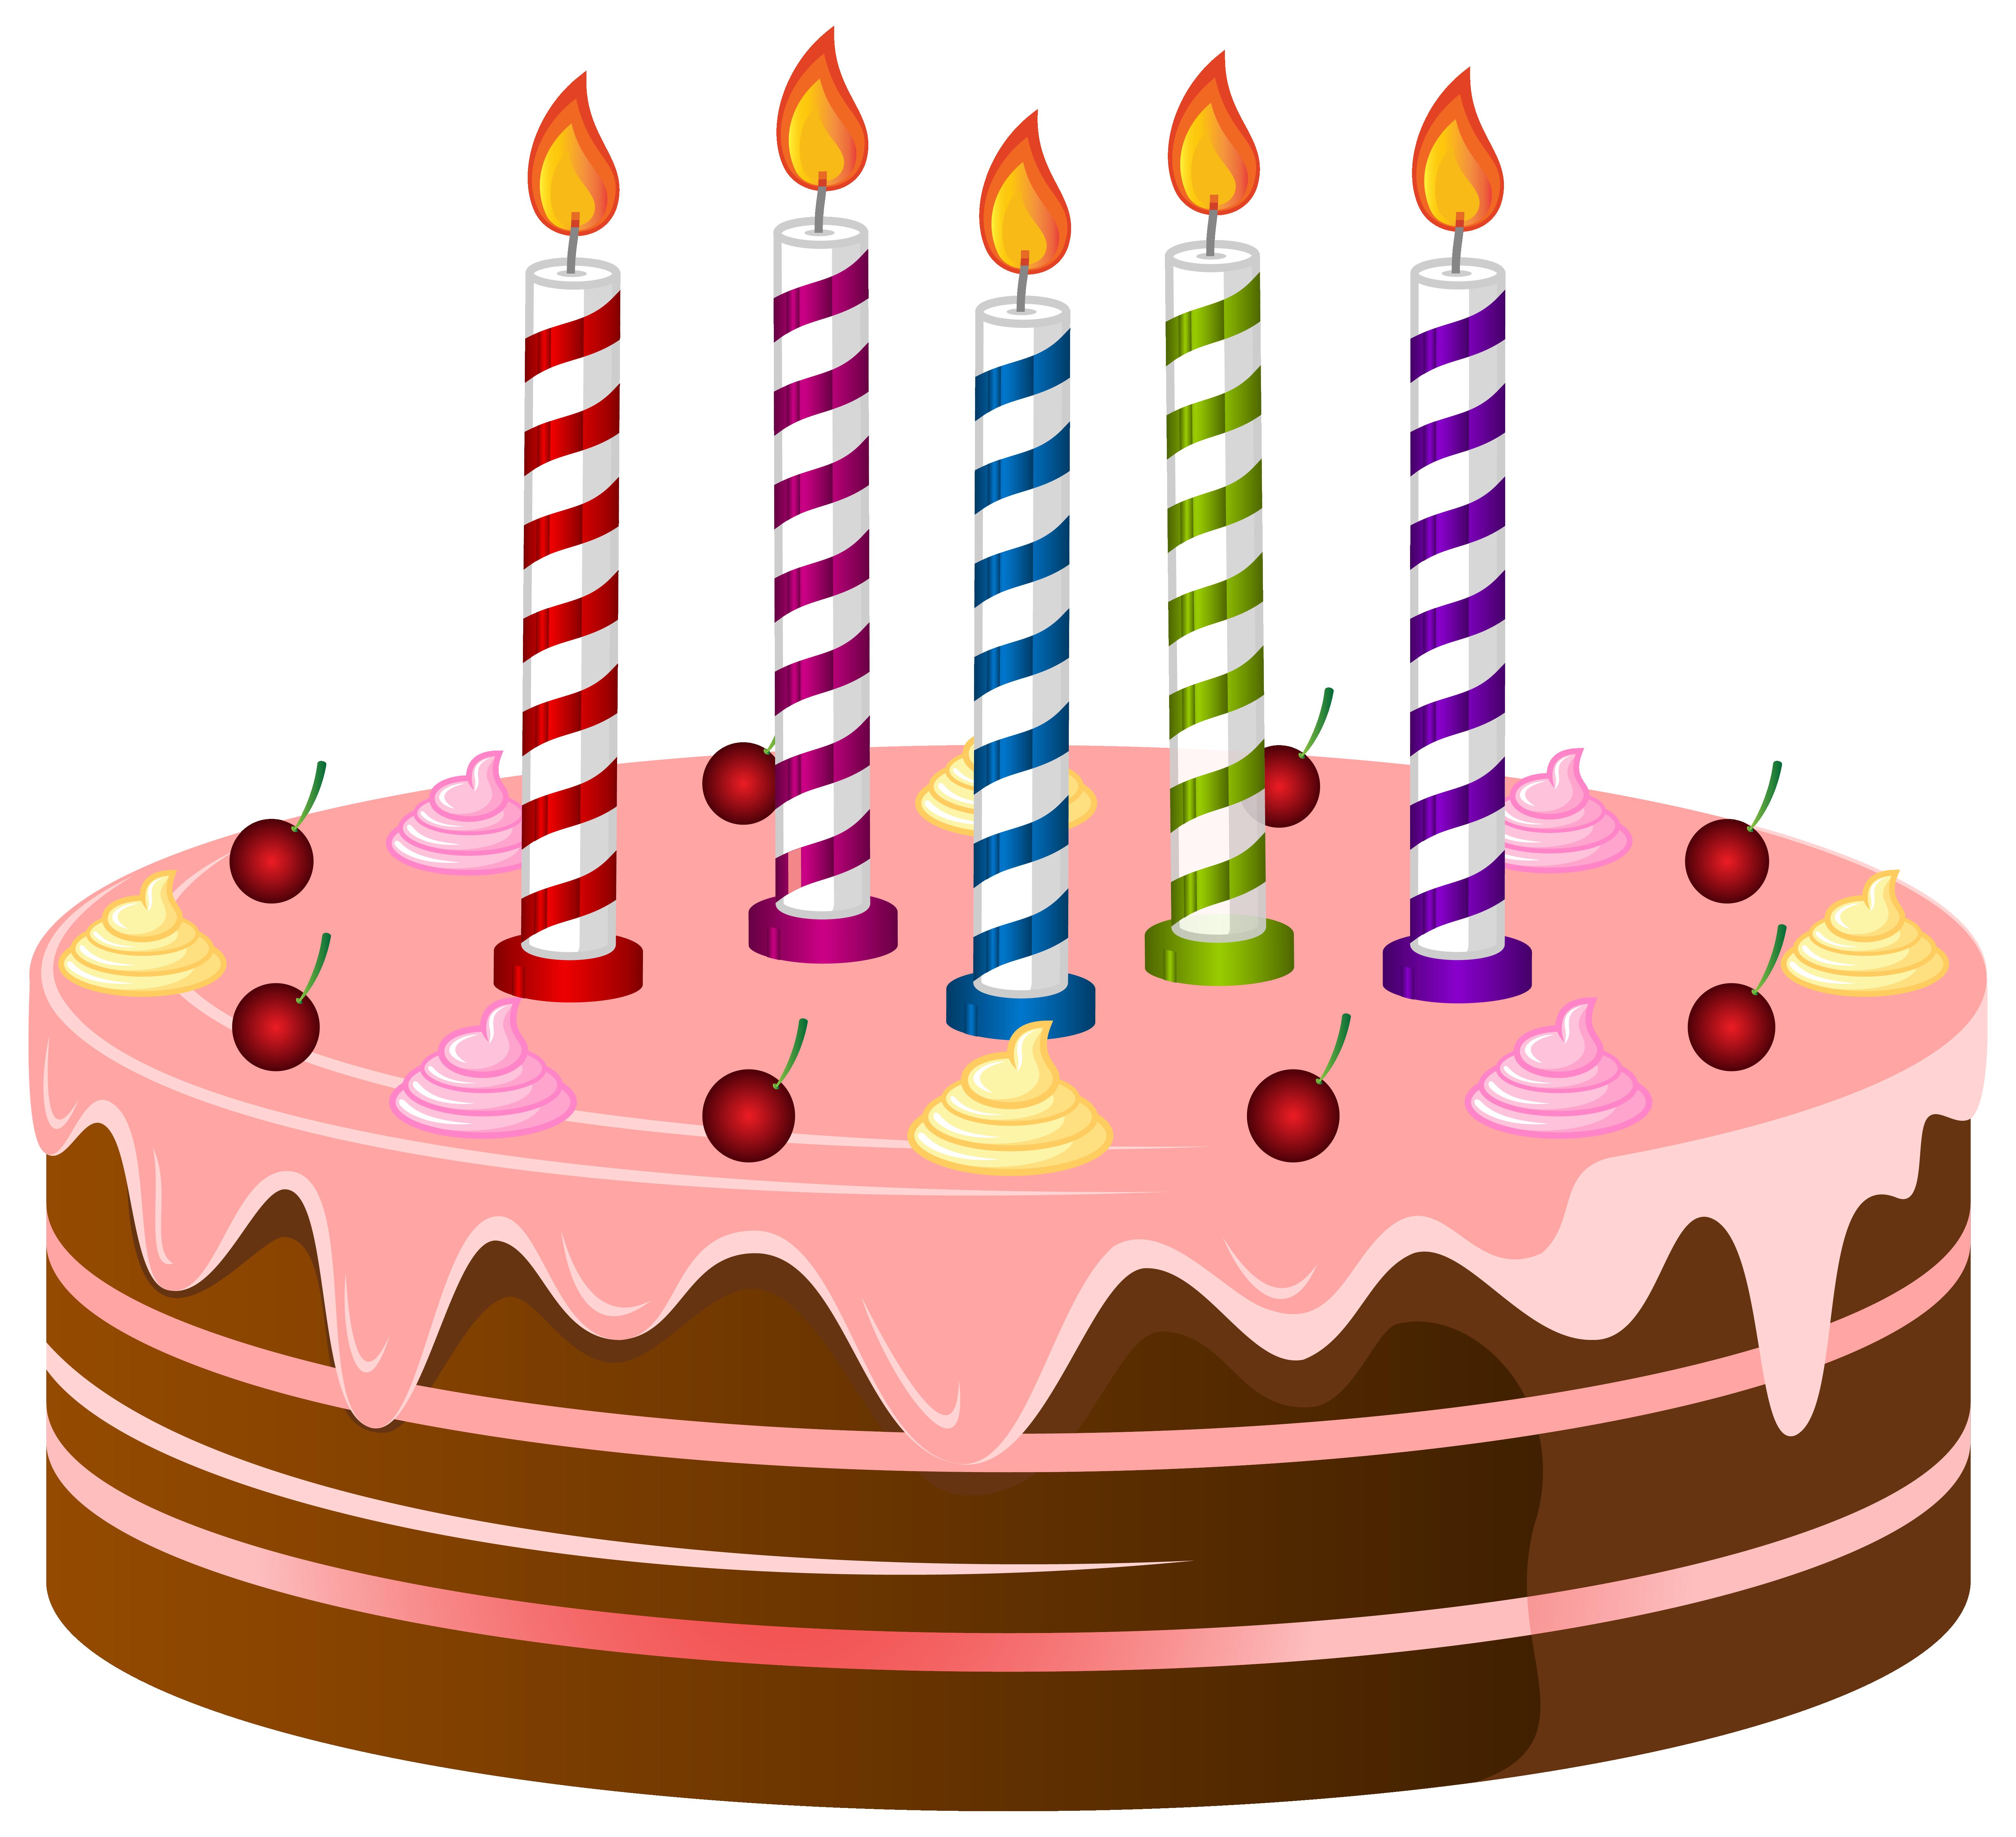 Birthday Cake Clipart Free - .-Birthday cake clipart free - .-11